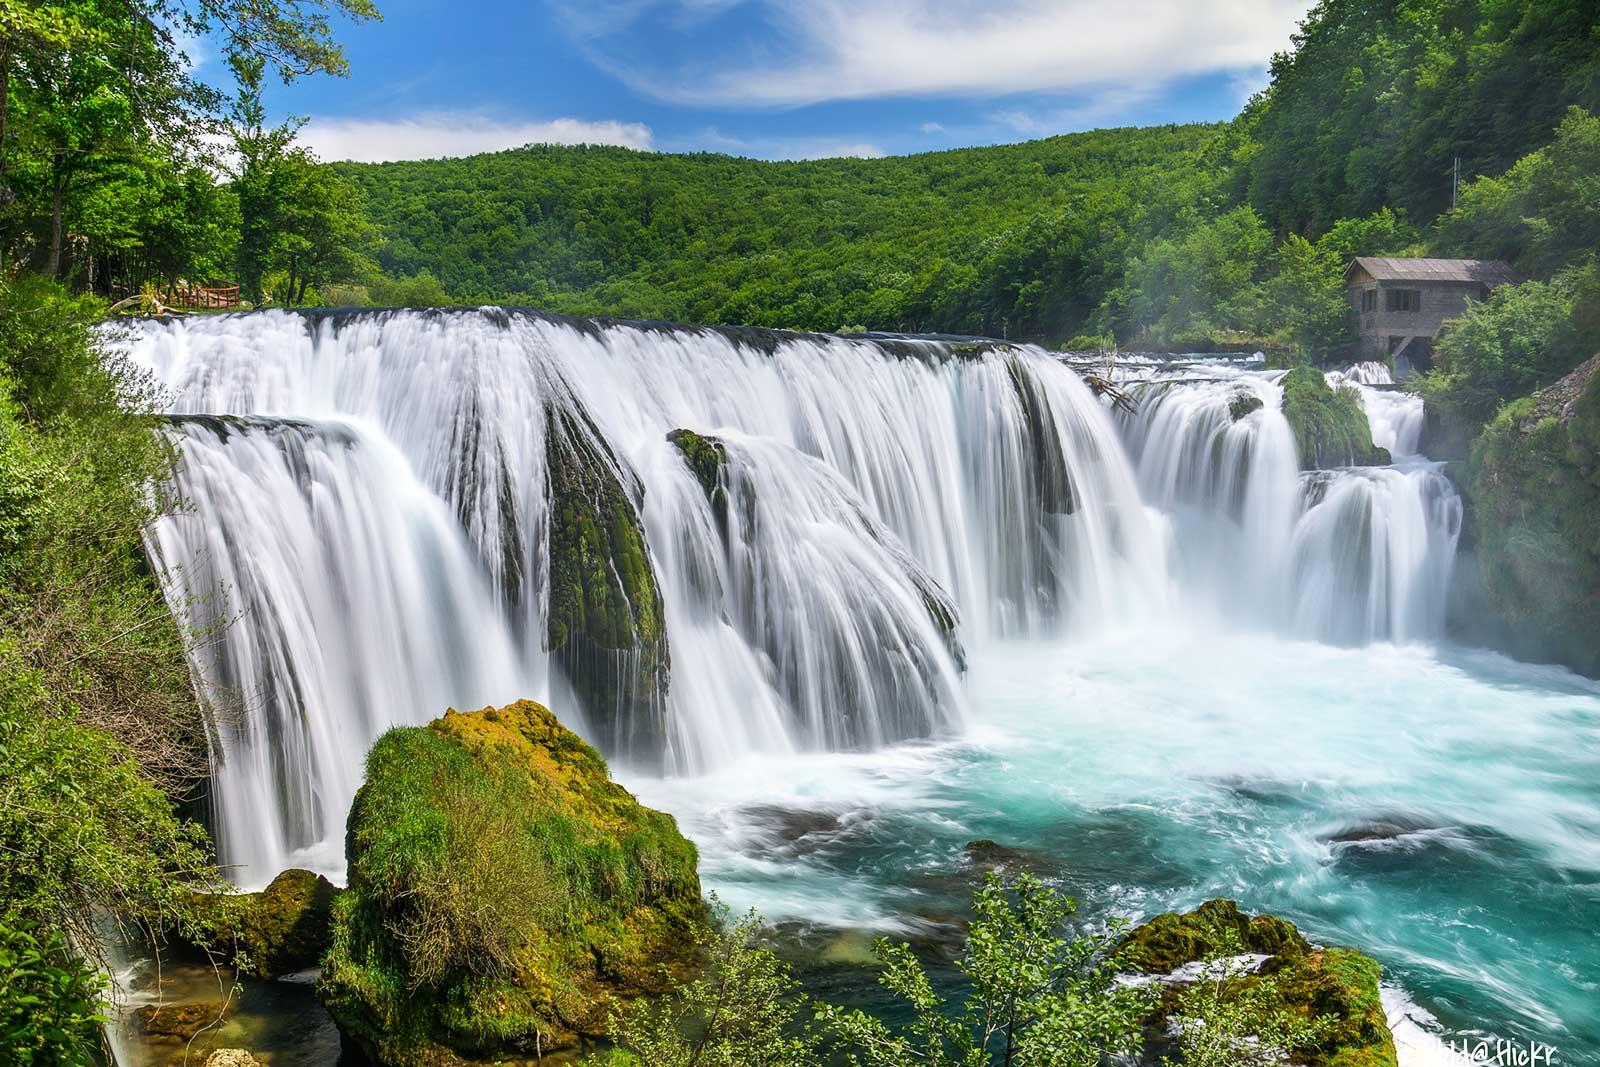 Strbacki Buk Waterfall - Una National Park